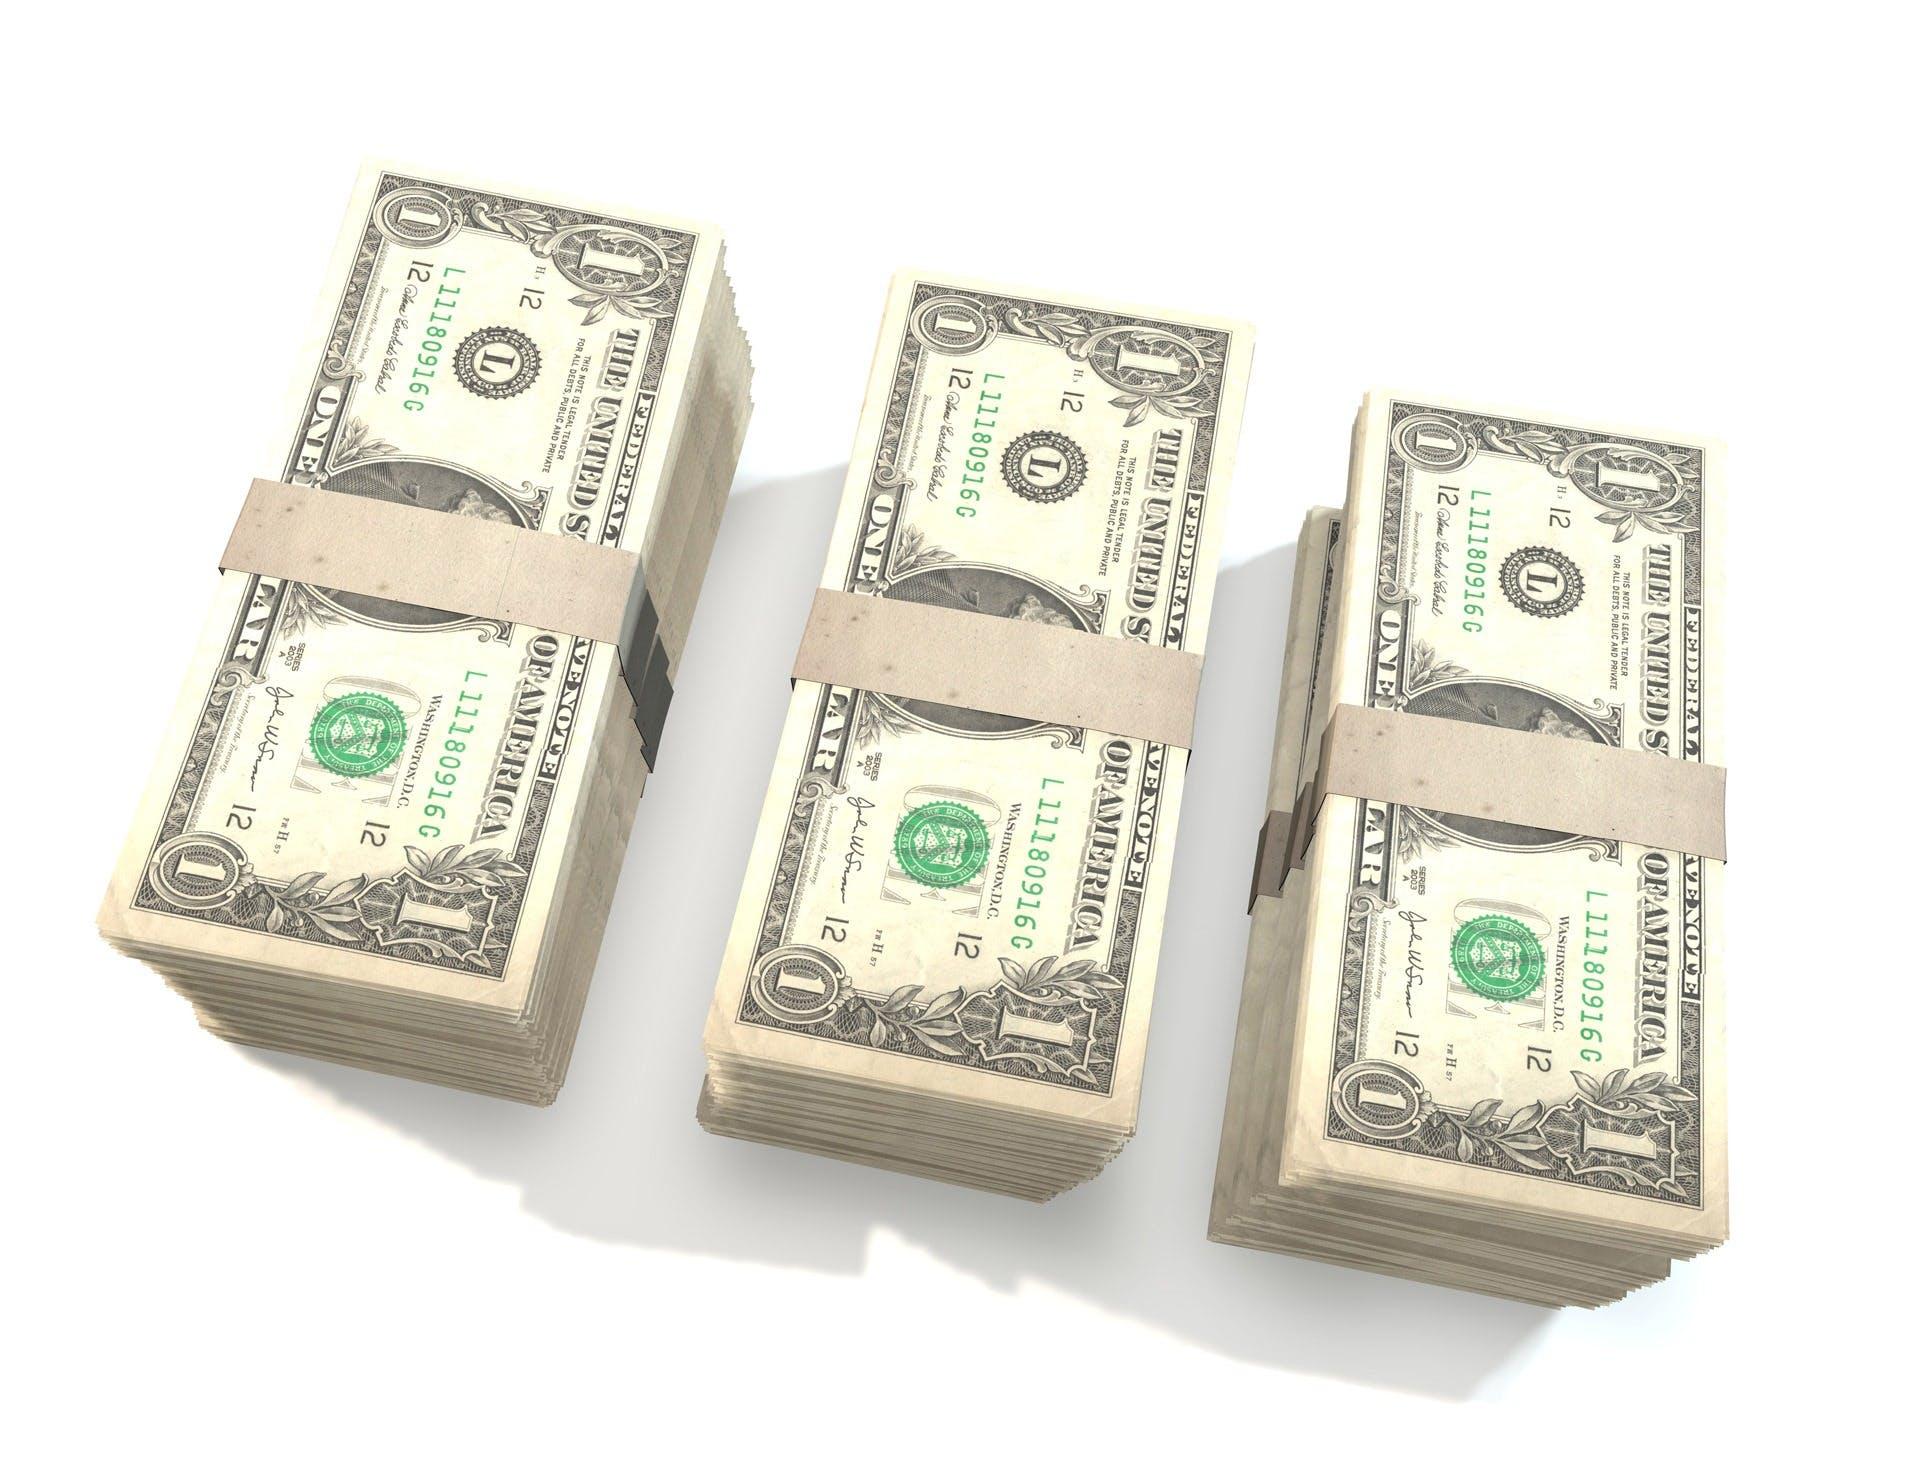 Three 1 Us Dollar Bundles